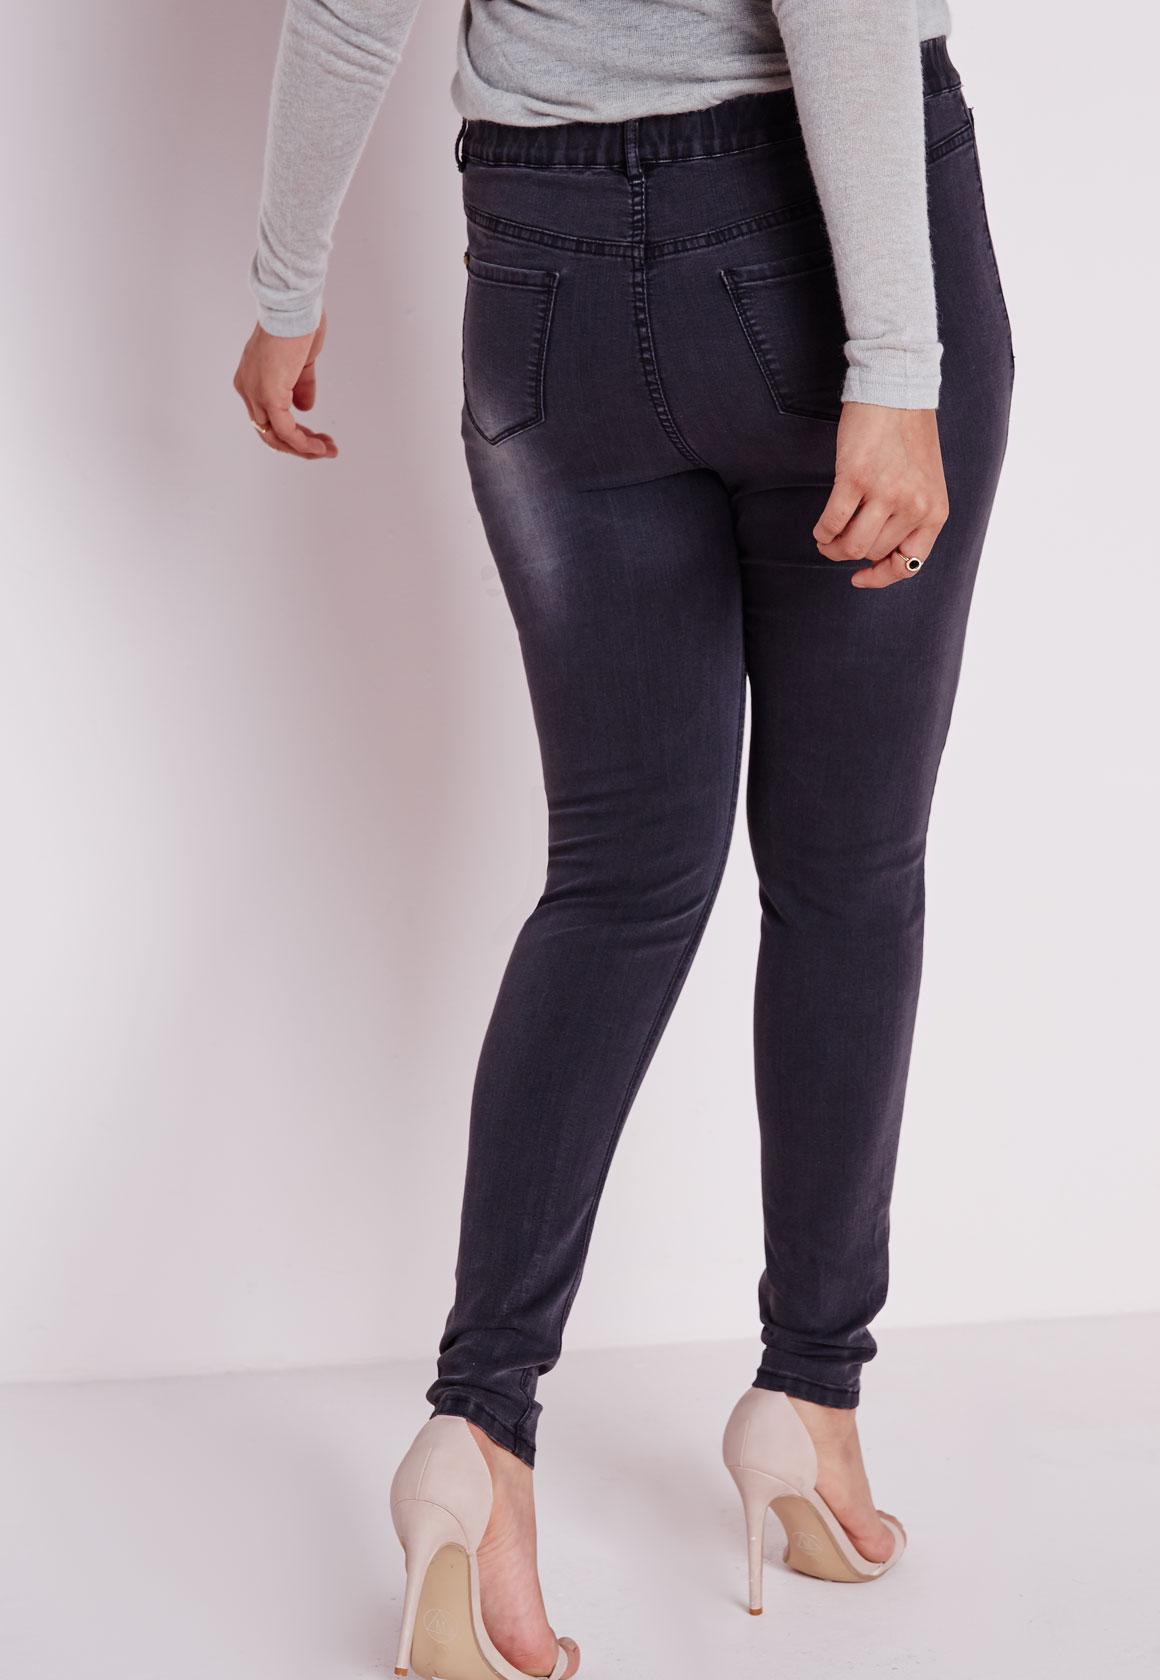 Plus Size Denim Jeggings Black - Plus Size Leggings - Women's plus ...